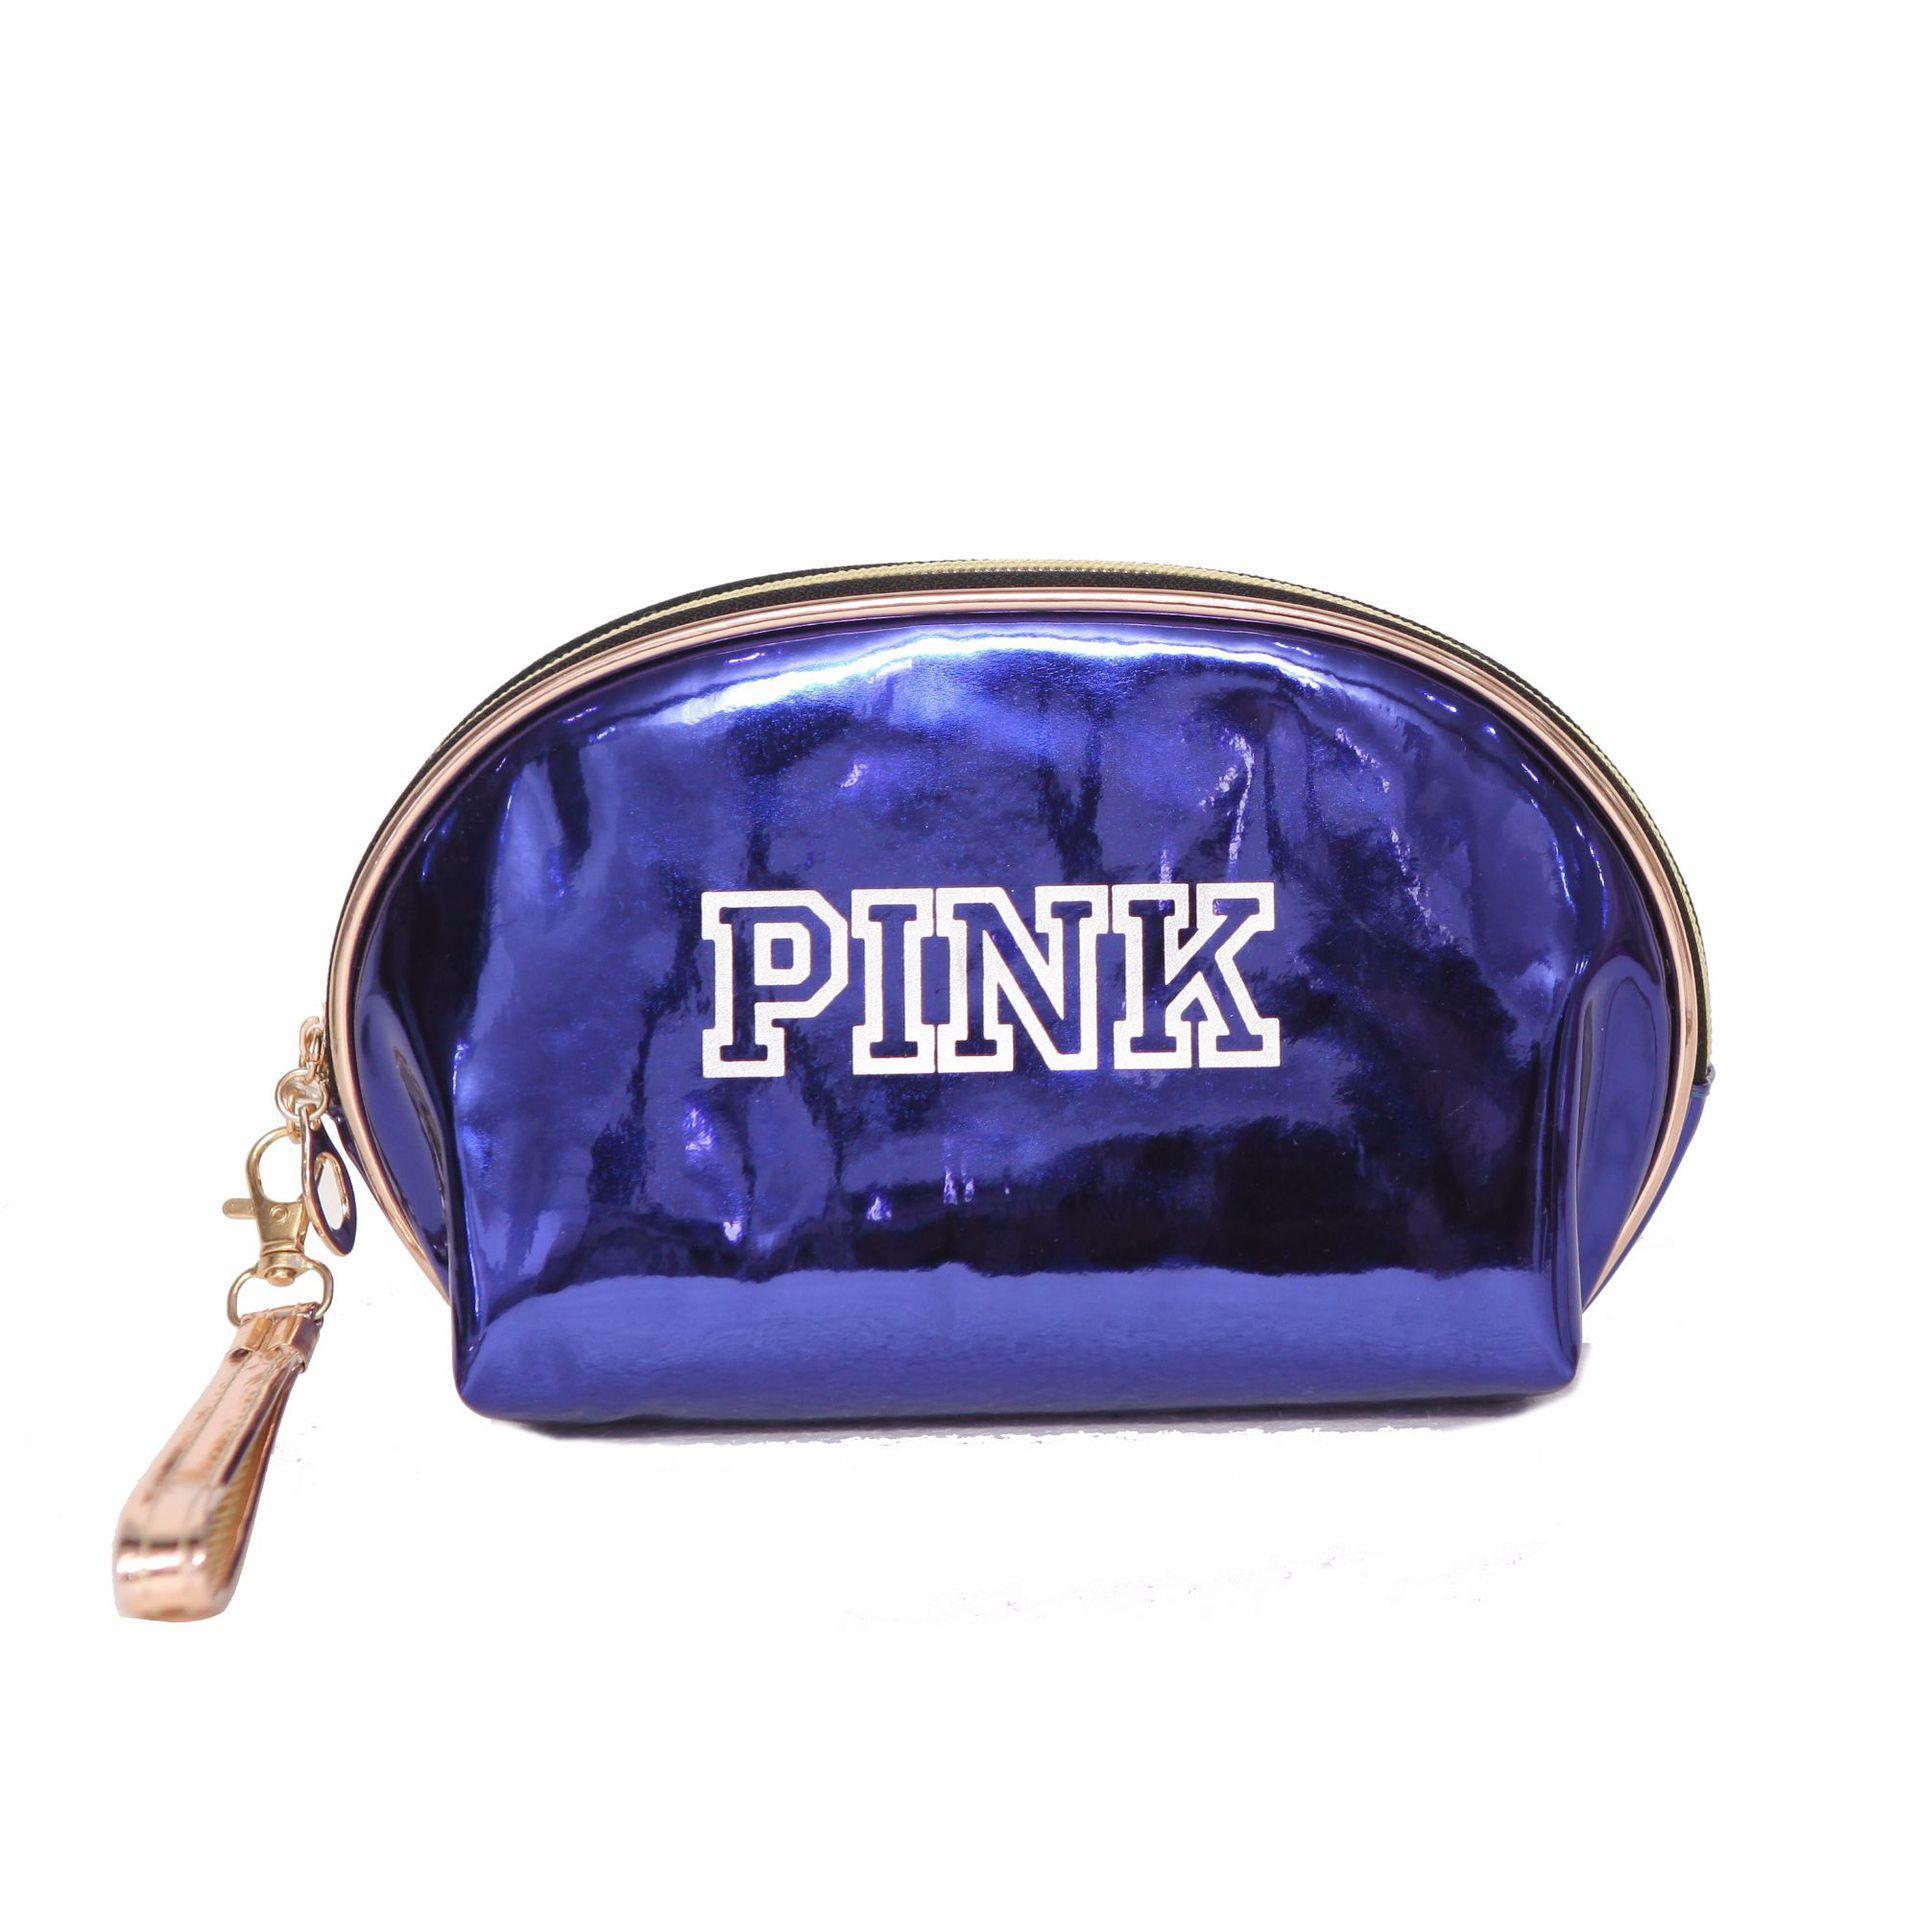 Fashion Waterproof Laser Cosmetic Bags Women Handbag Portable Travel Makeup Bag Pouch Organizer Toiletry Kit Bag Make Up Bag